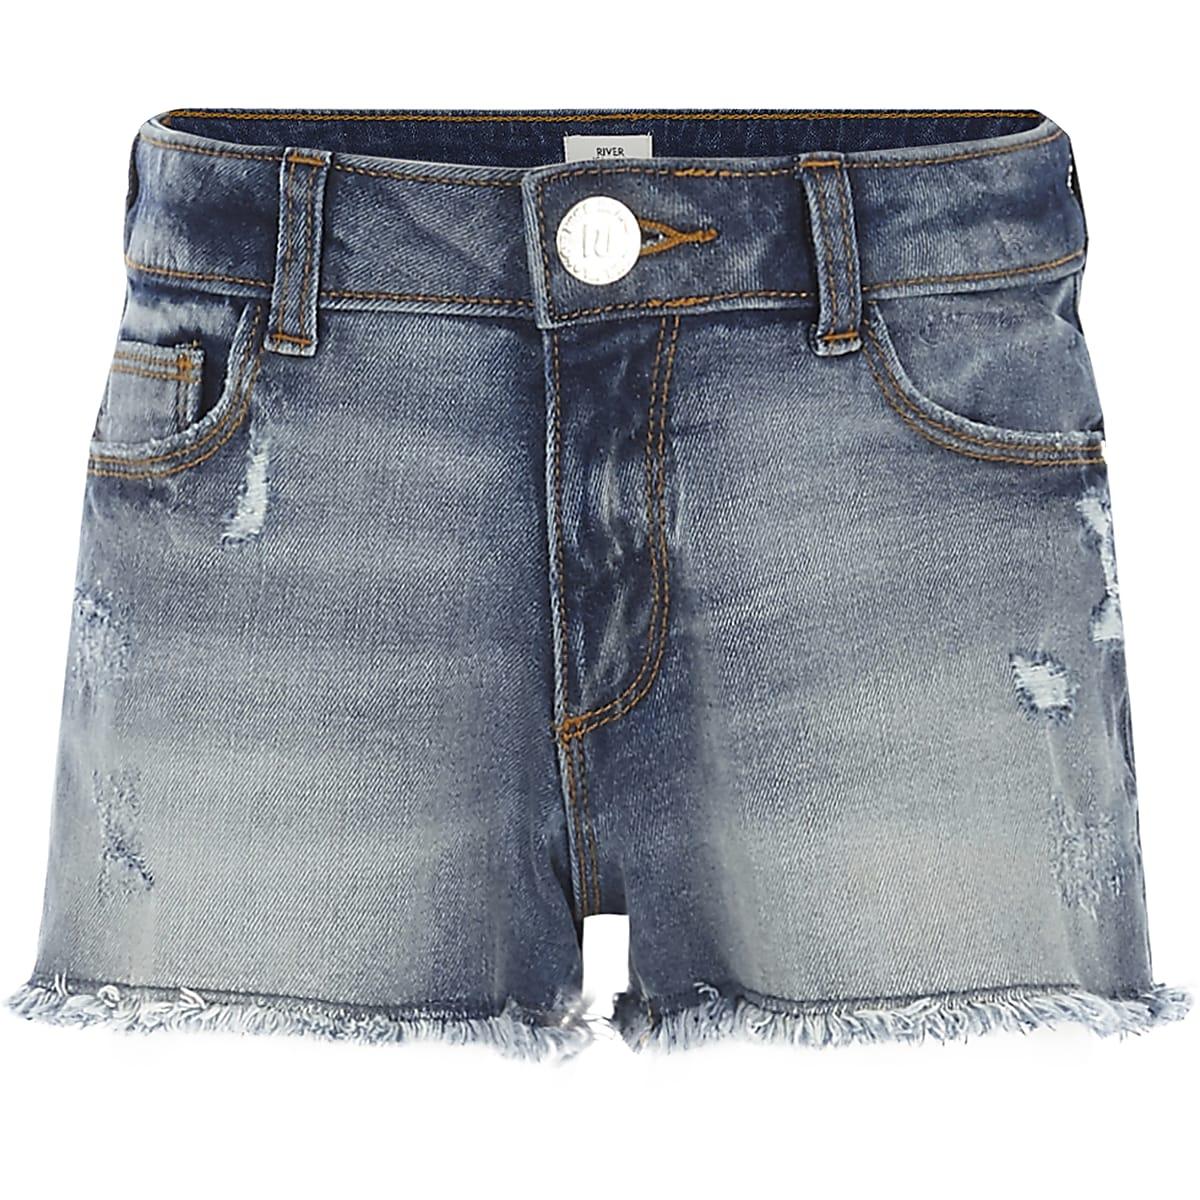 Girls blue distressed denim shorts